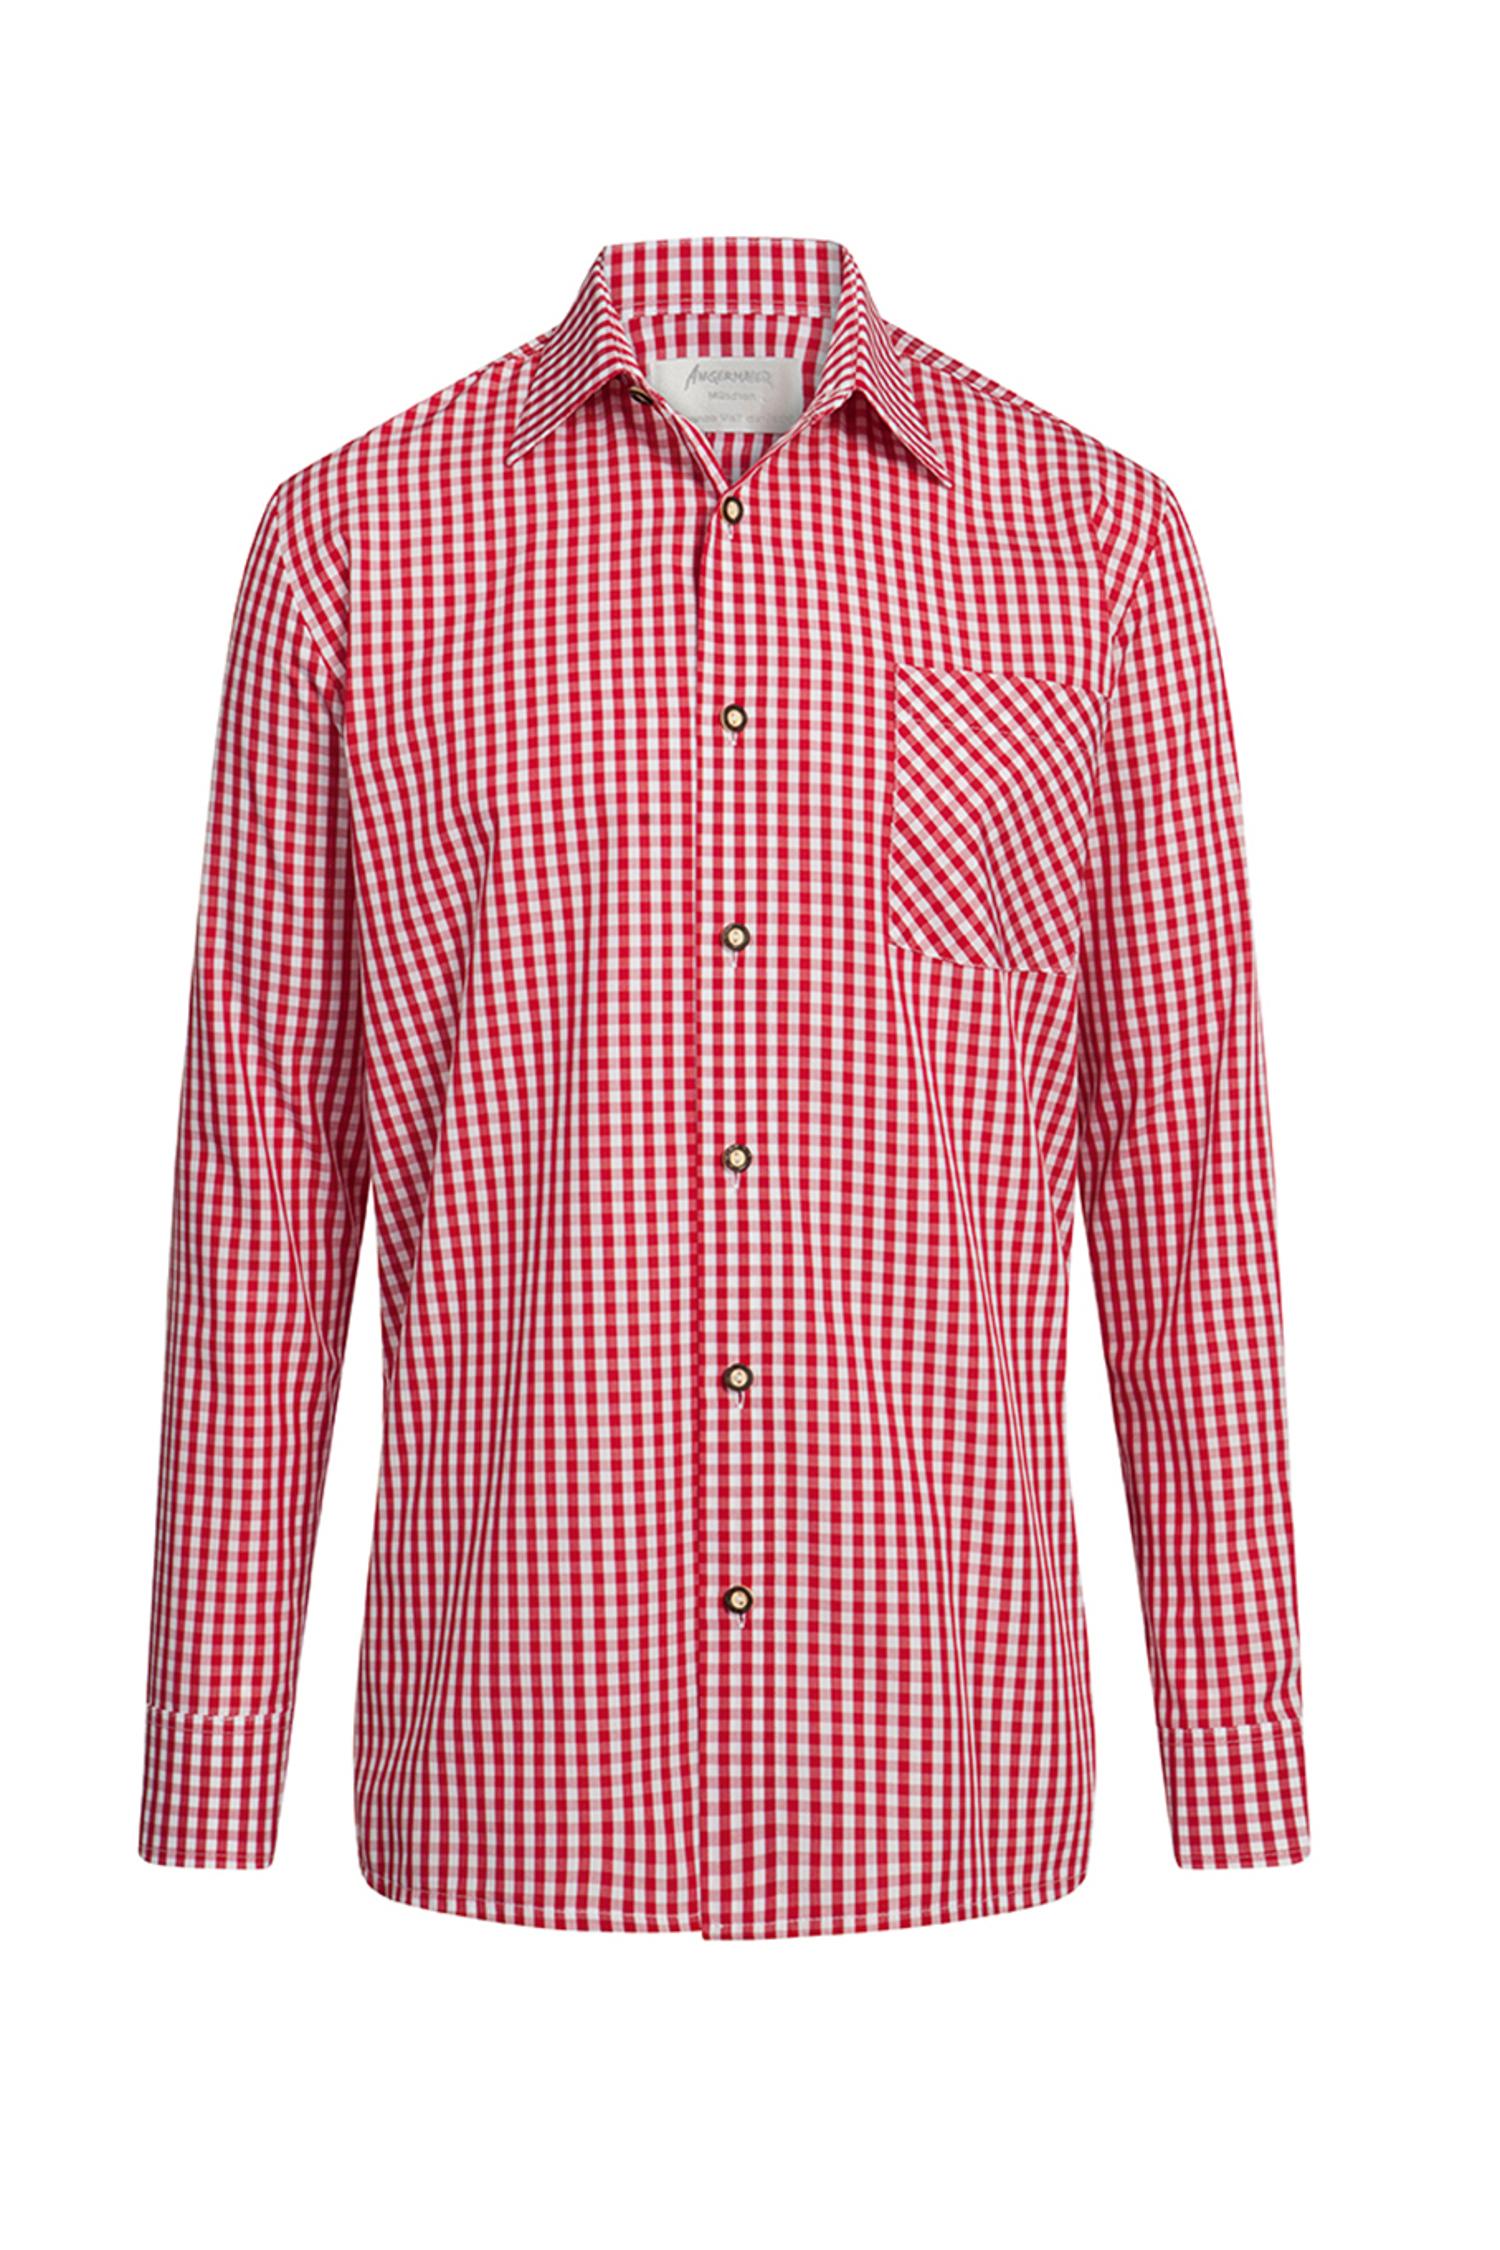 Trachtenhemd L | rot-karo